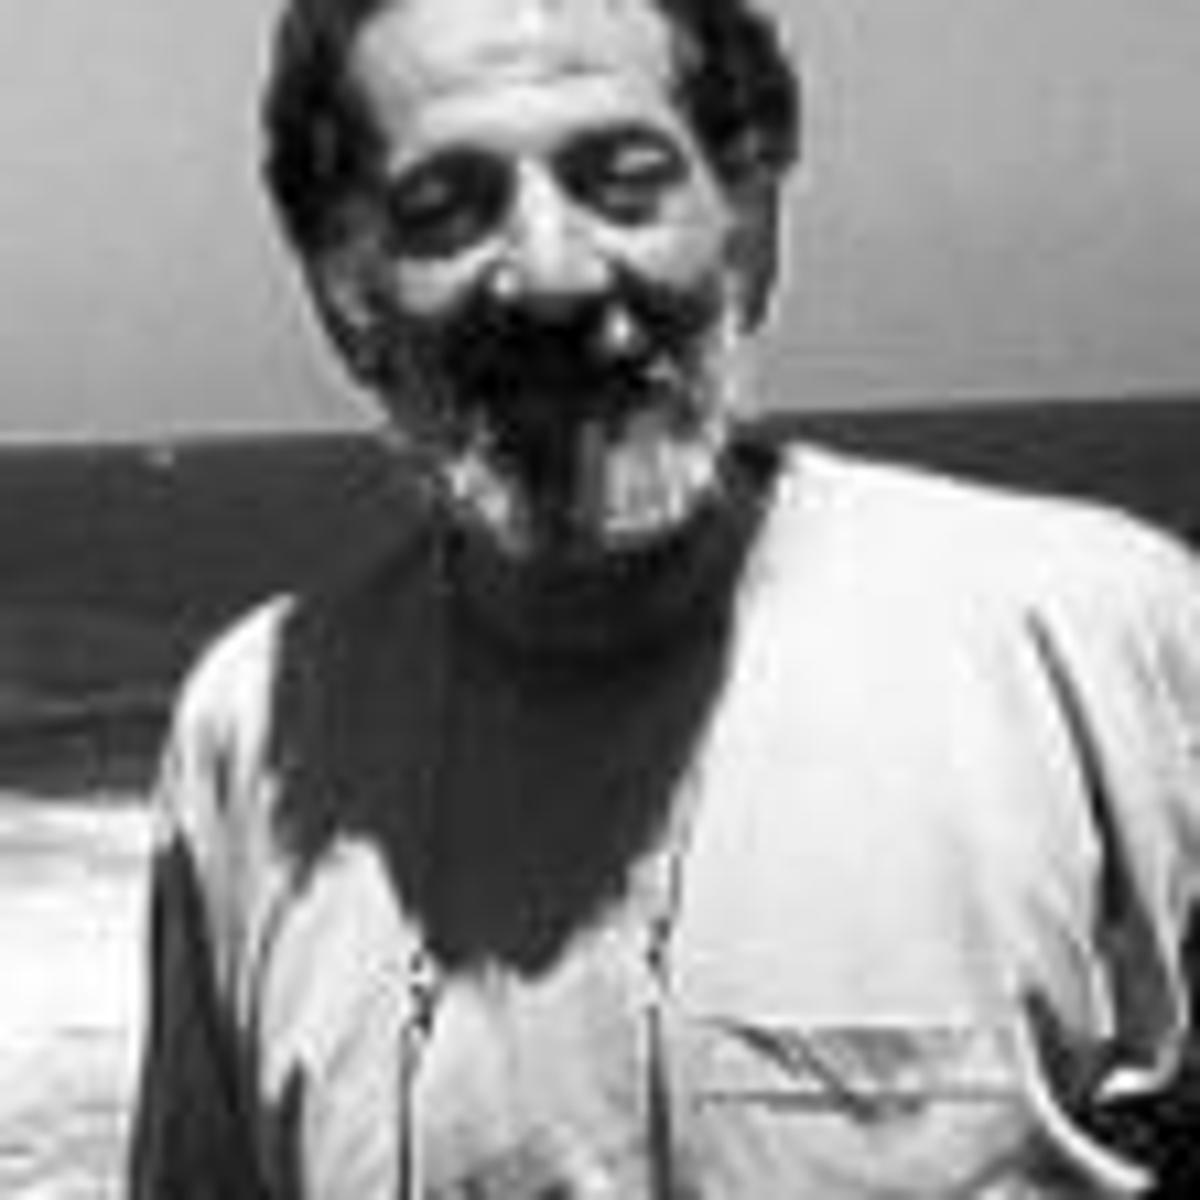 Kiczales Dr Adolphe Kic Obituaries Richmond Com